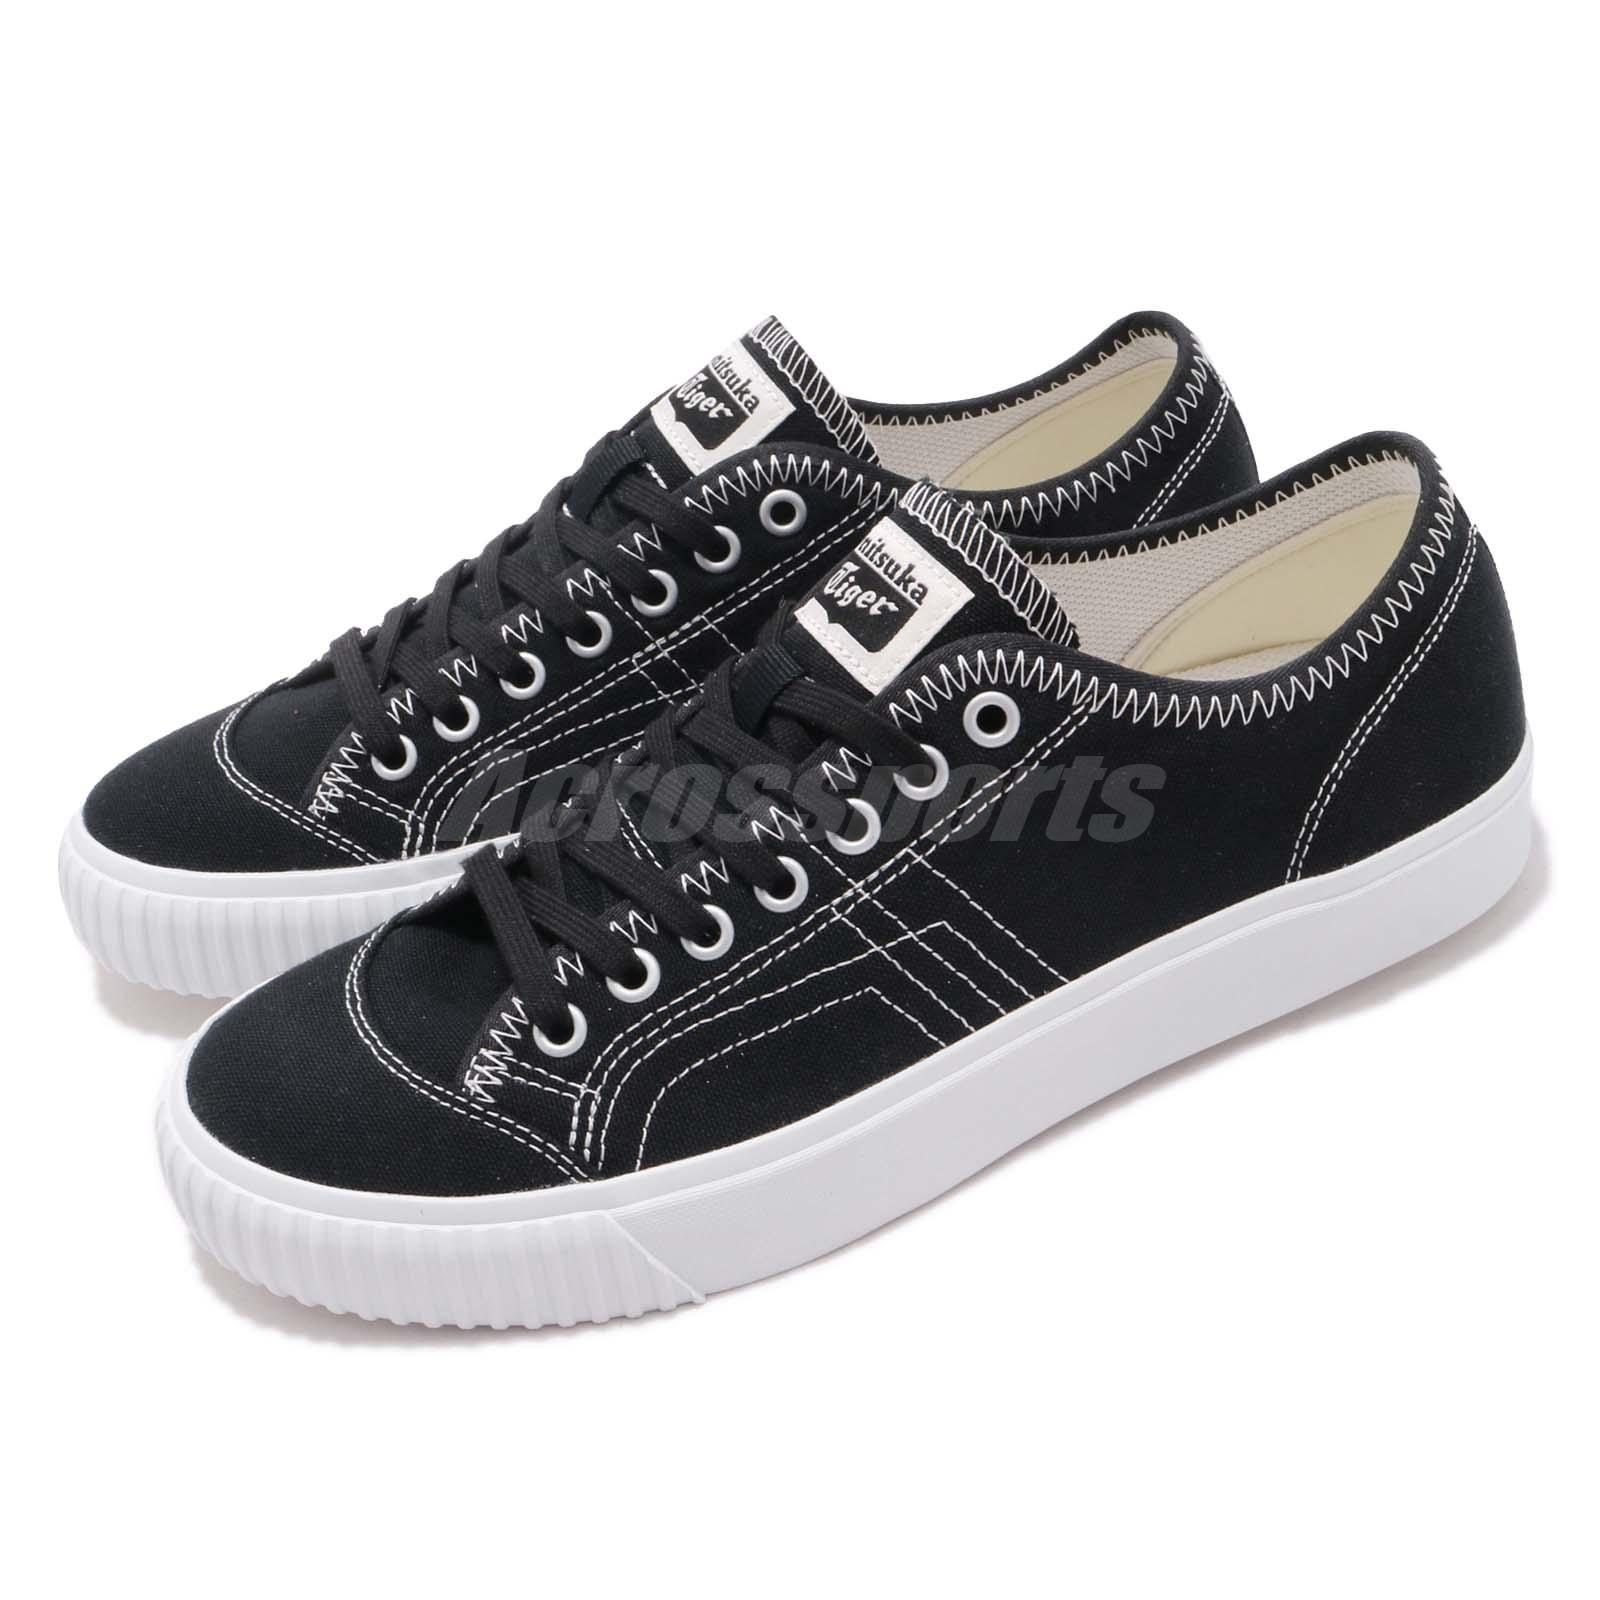 zapatos onitsuka tiger en guatemala lavado